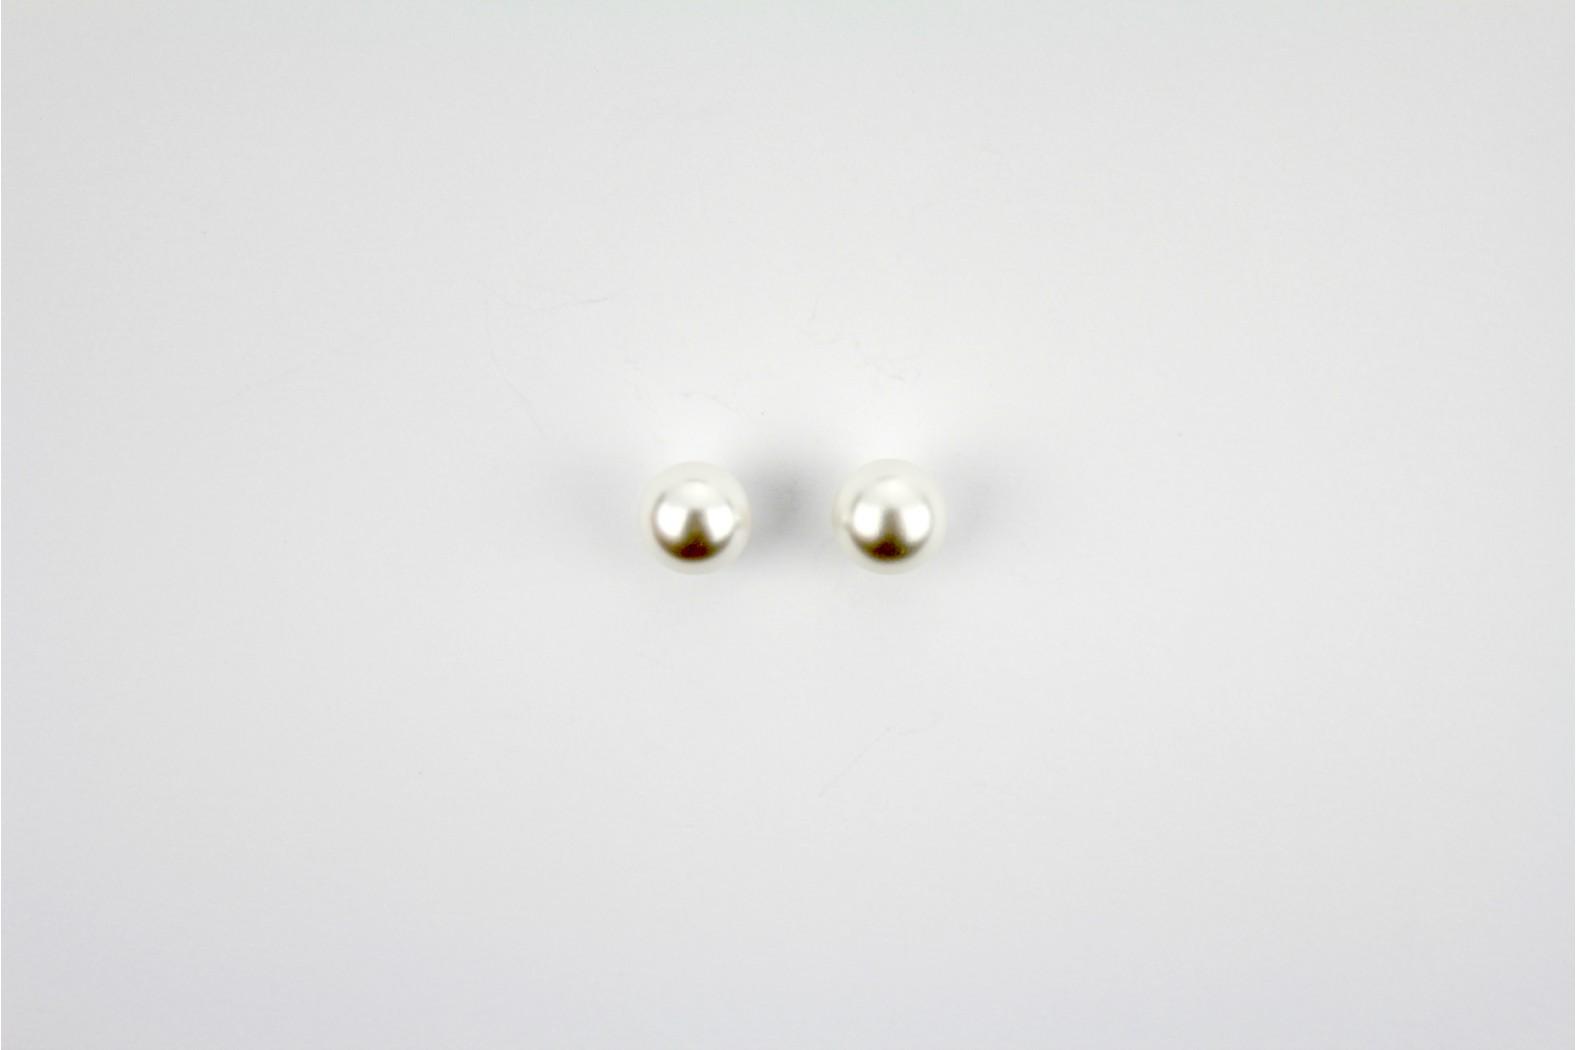 Circular silver colour large ball stud earrings